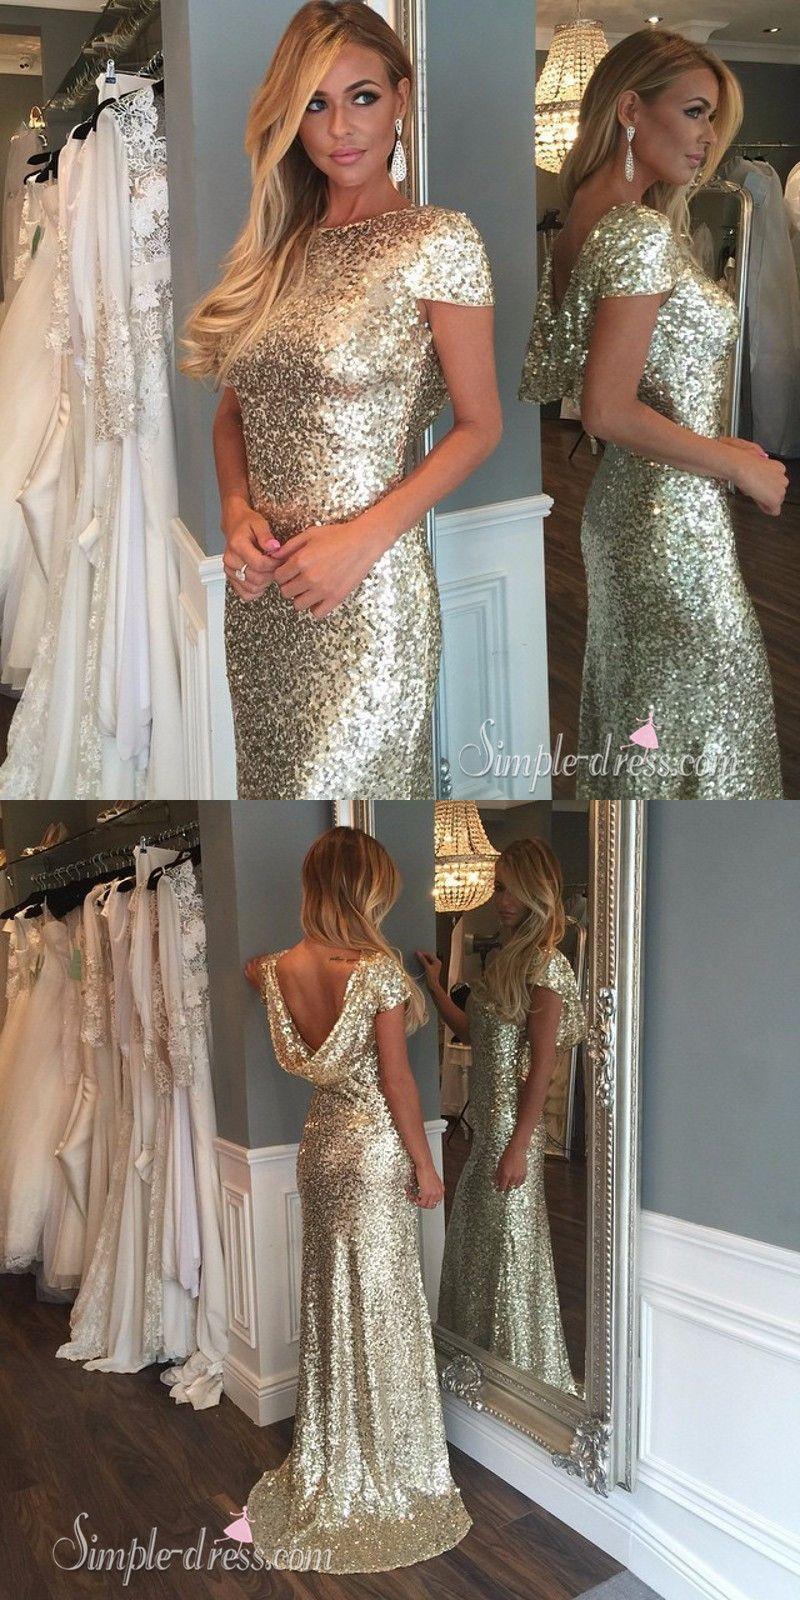 Sheath crew neck cap sleeveless sweep train gold sequins prom dress